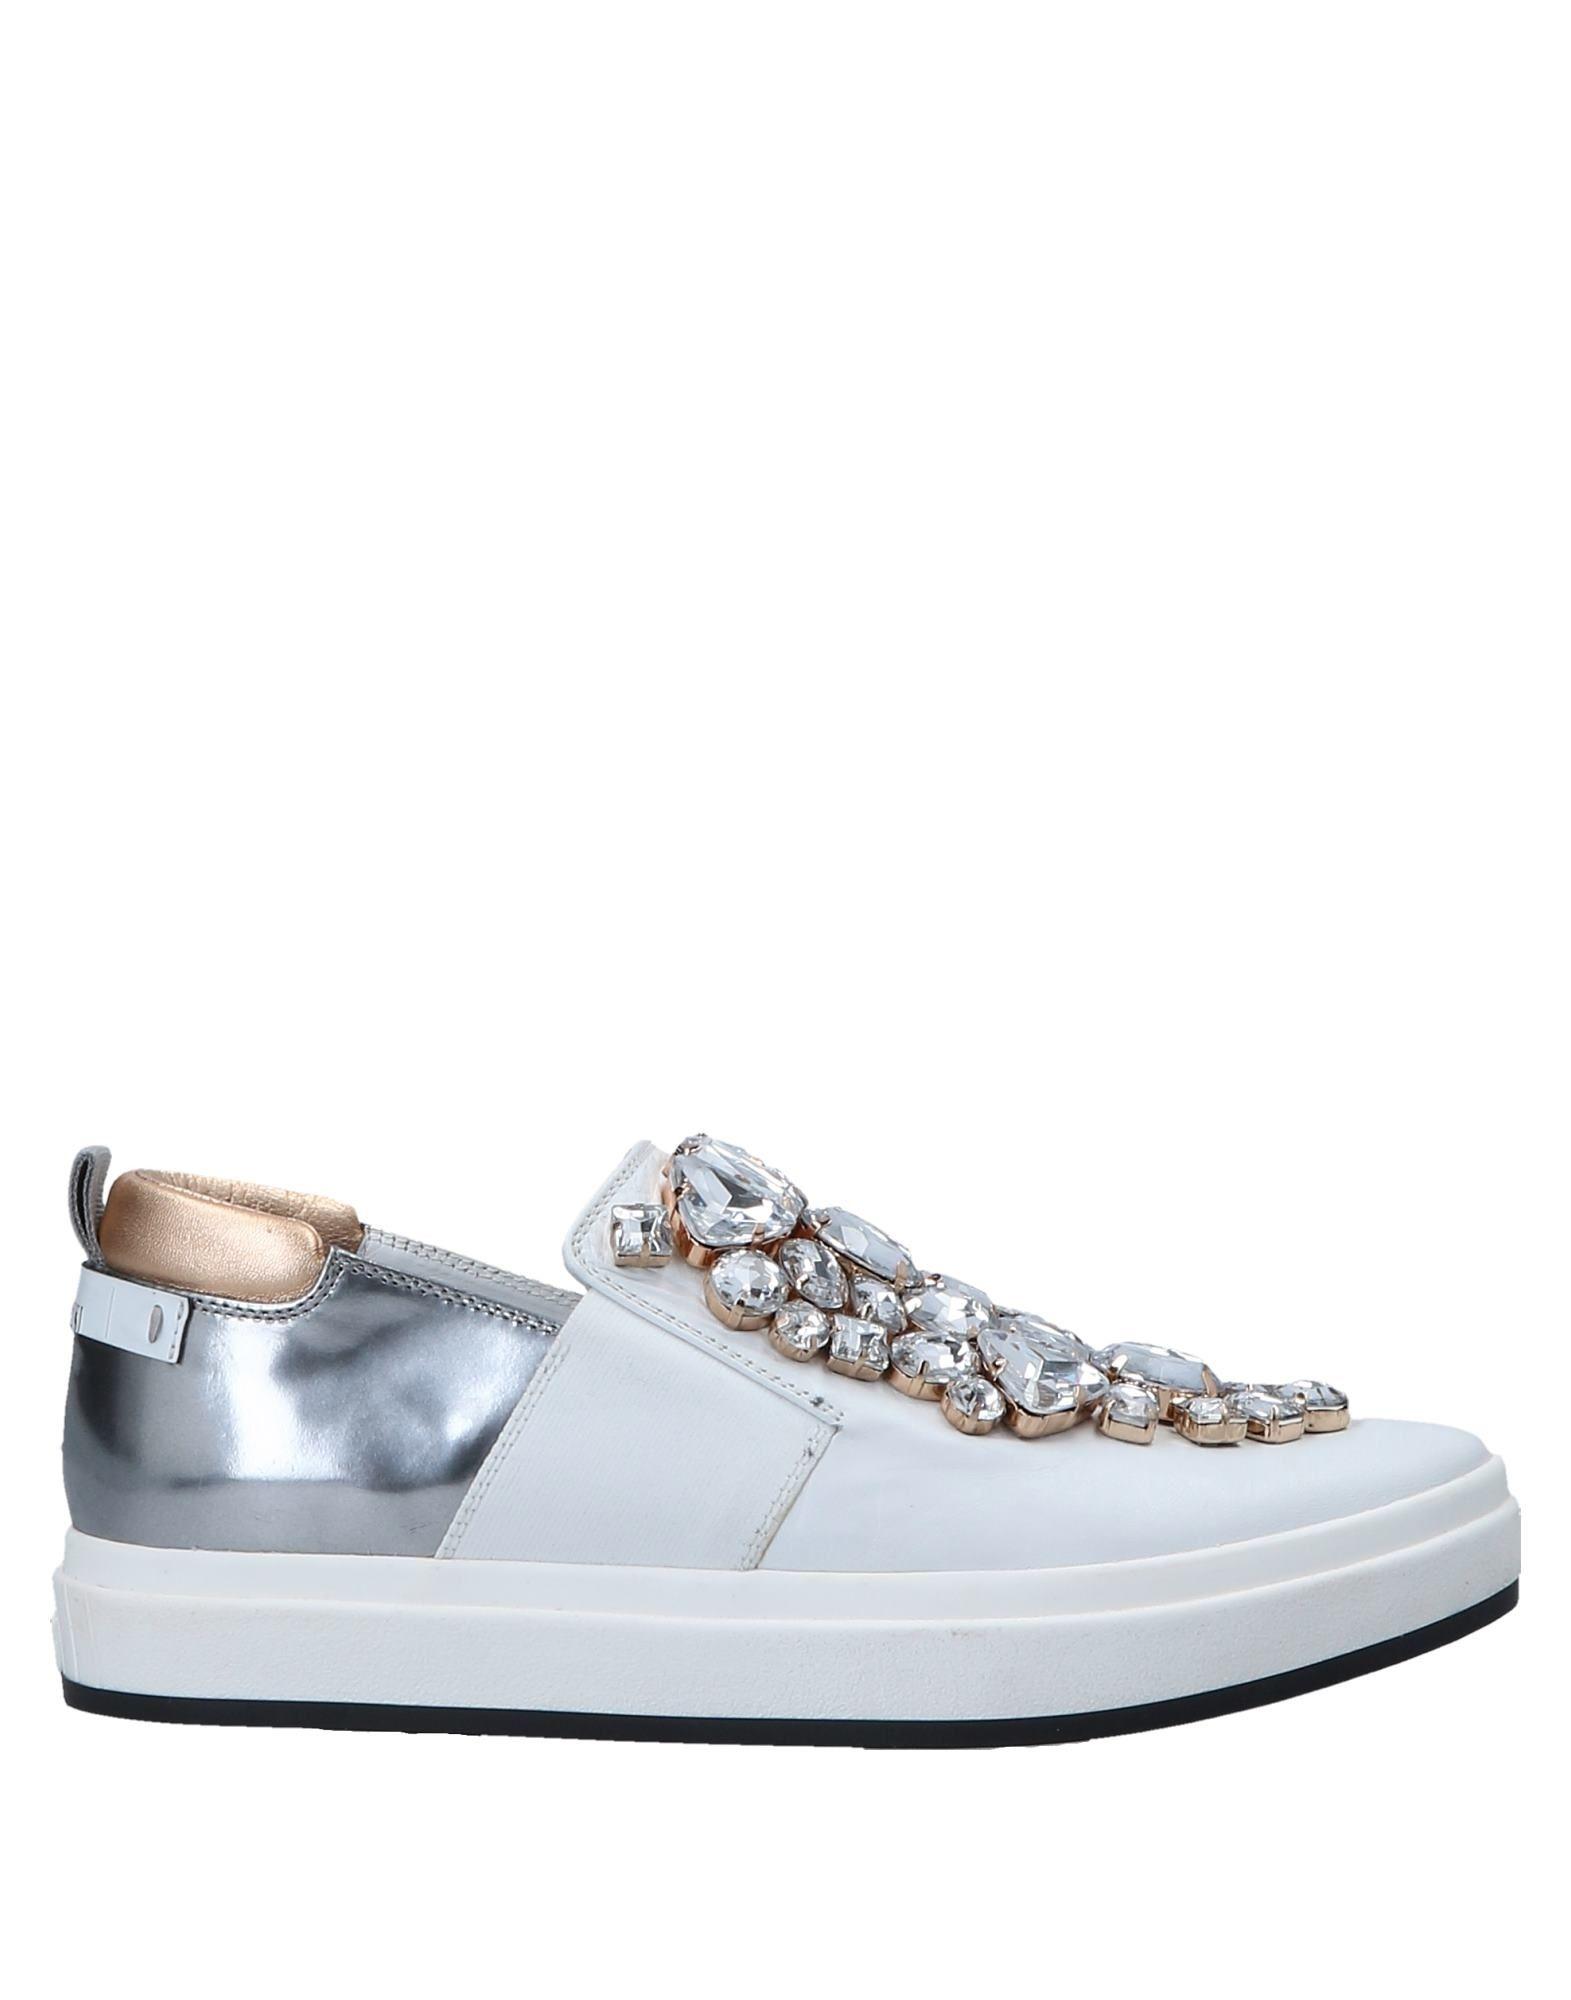 Shy By Arvid Yuki Sneakers - Women Shy online By Arvid Yuki Sneakers online Shy on  United Kingdom - 11556676BA c1bbec